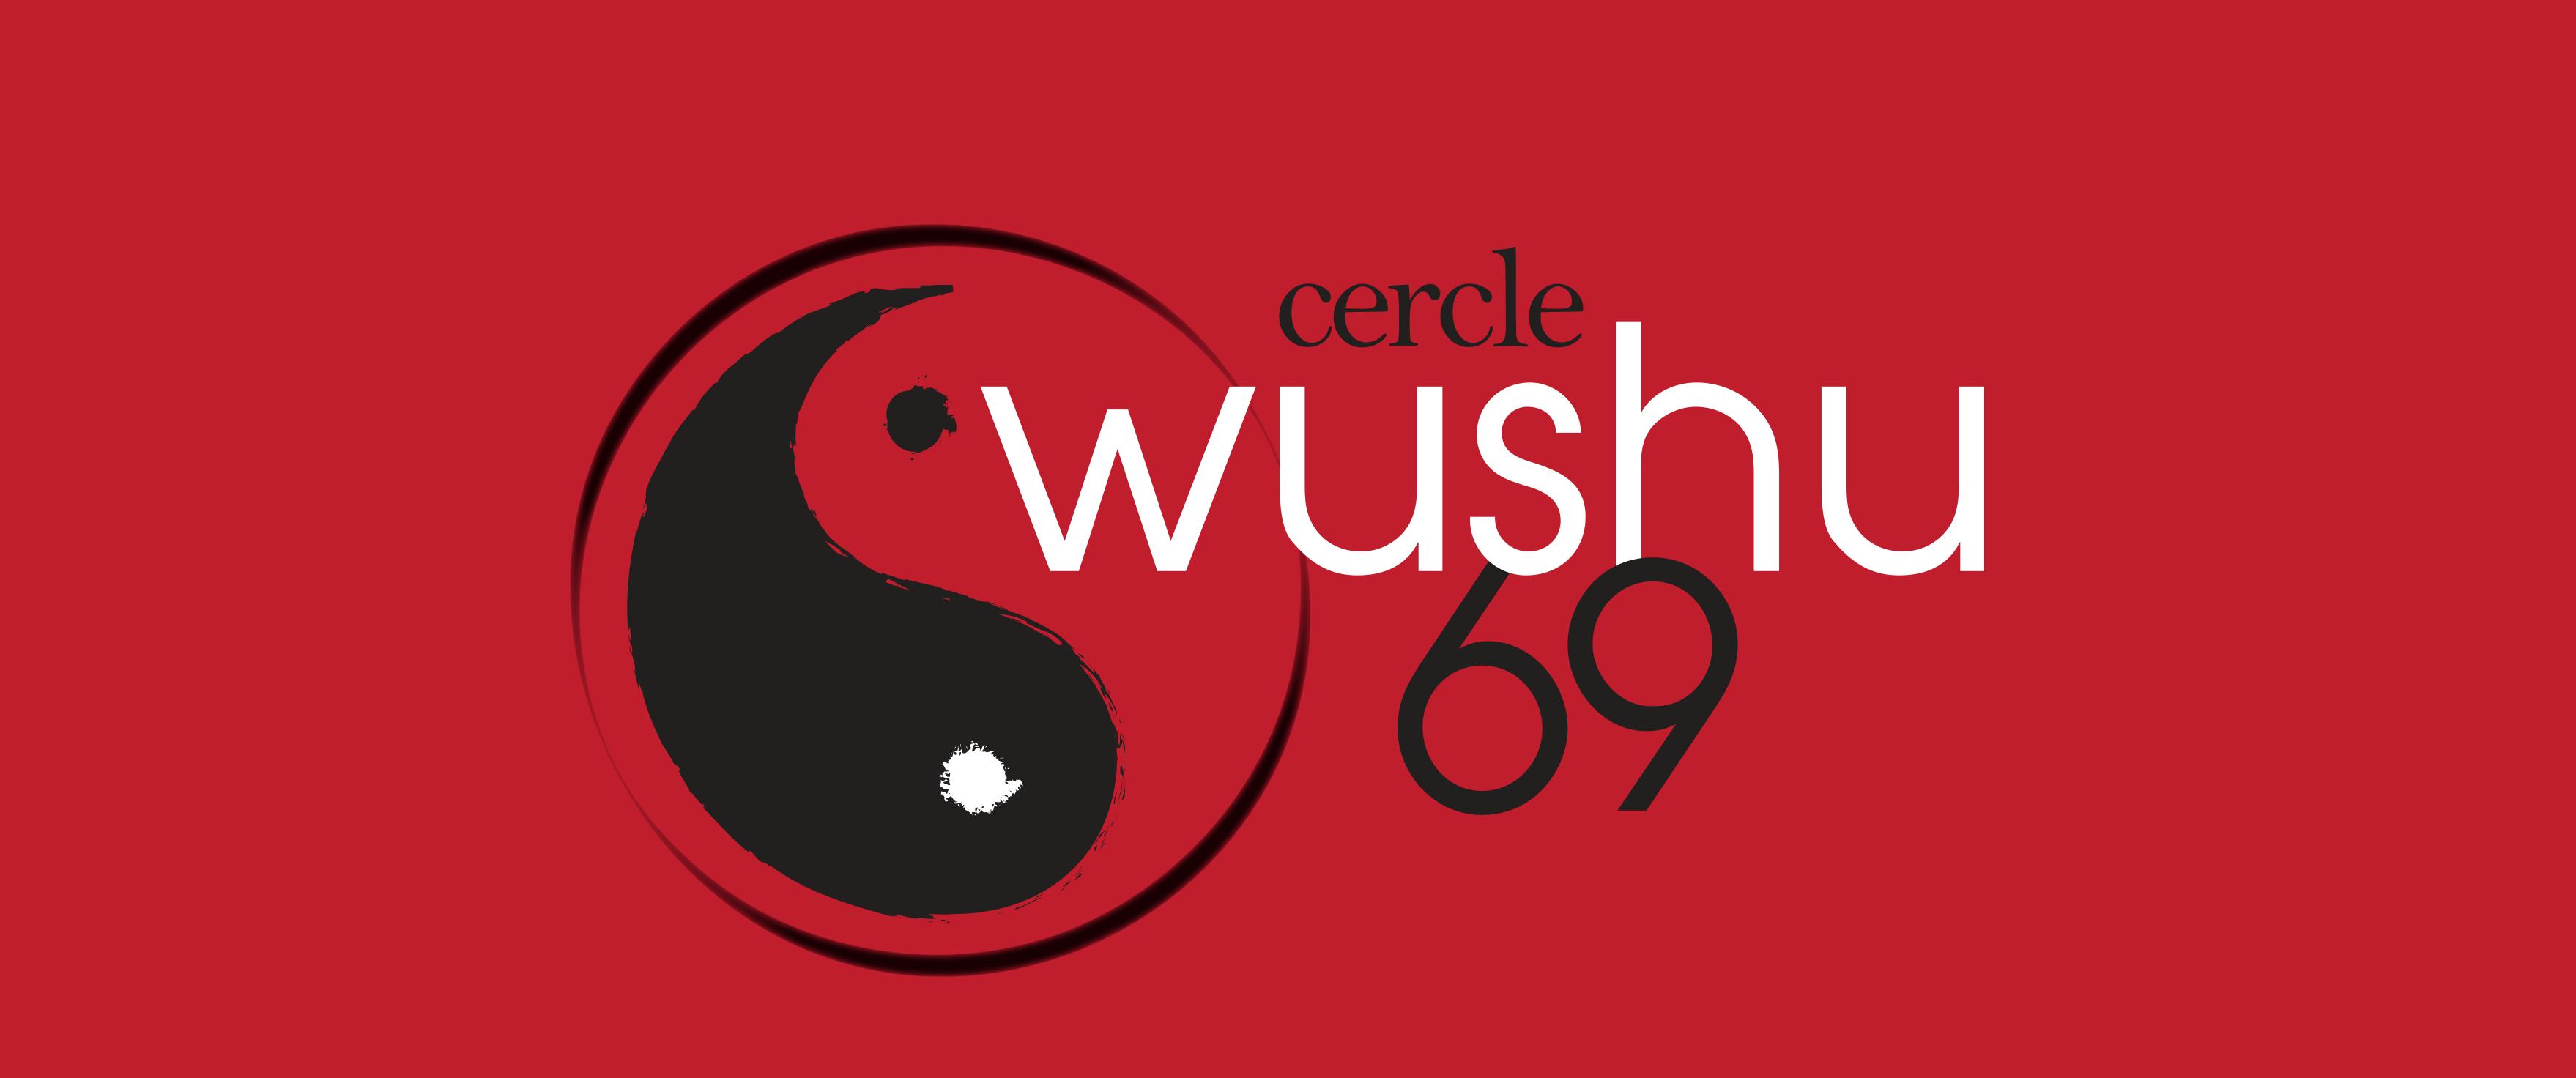 http://wushu69.fr/wp-content/uploads/2020/07/bandeaulogowushu.png